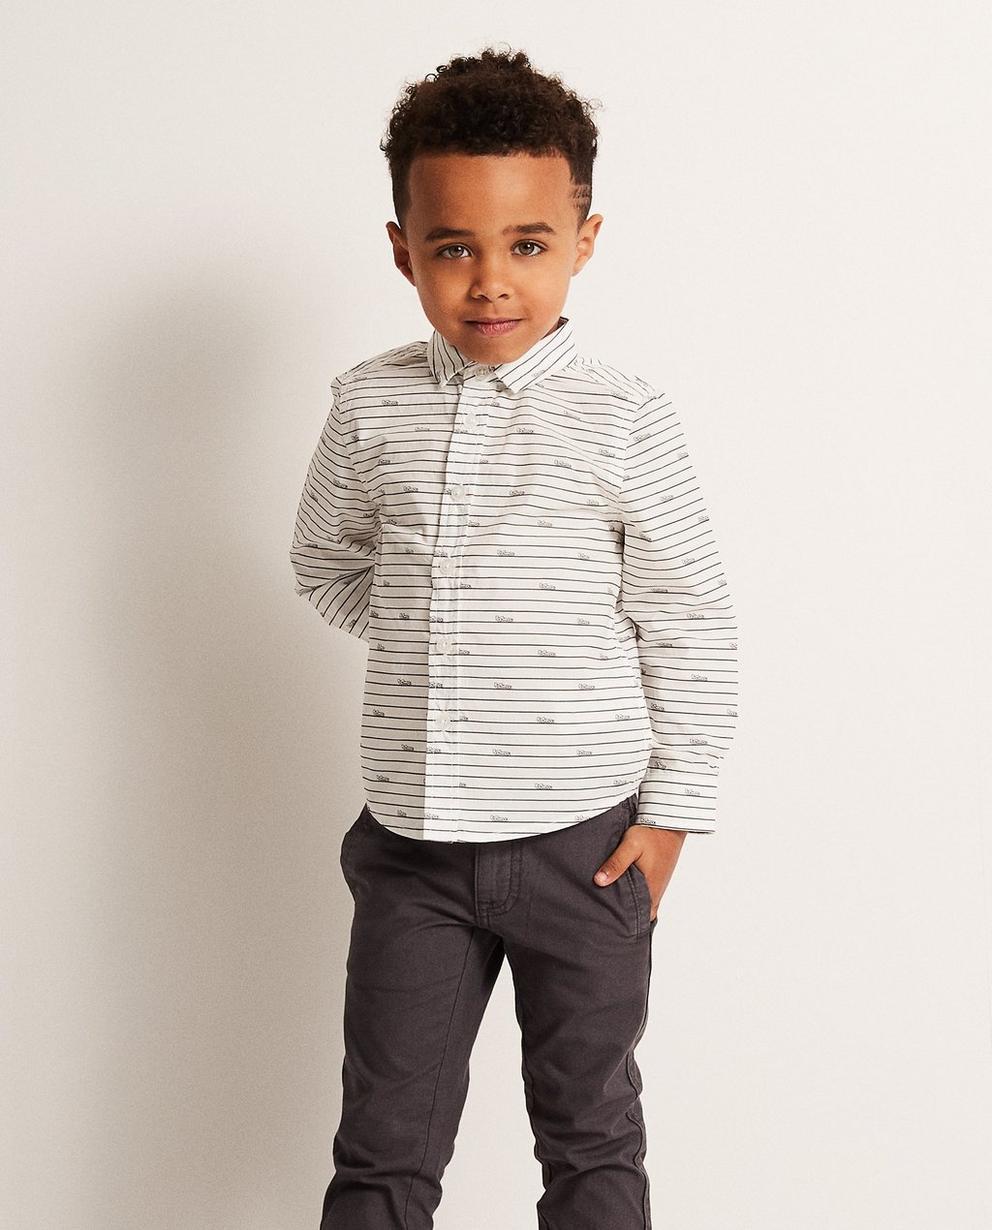 Hemden - AO2 - Hemd mit Allover-Autoprint